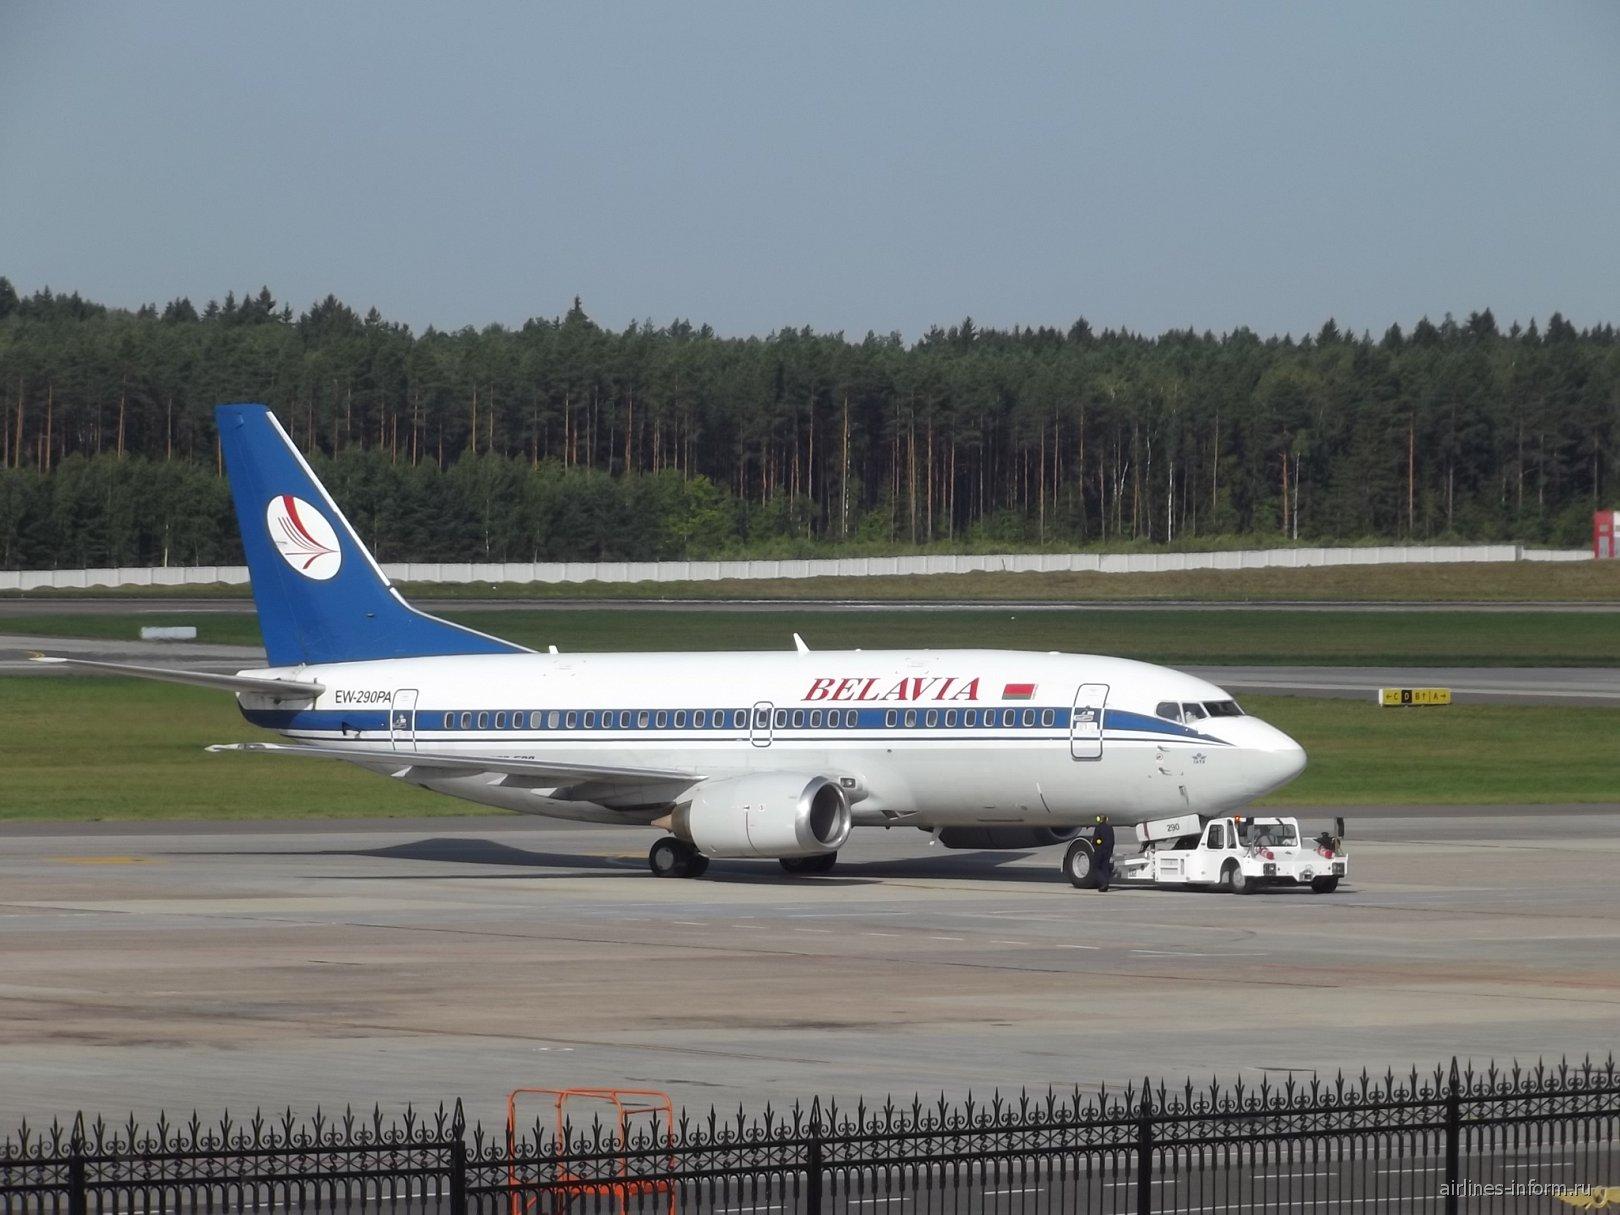 Boeing 737-500 EW-290PA буксирую для старта в Москву